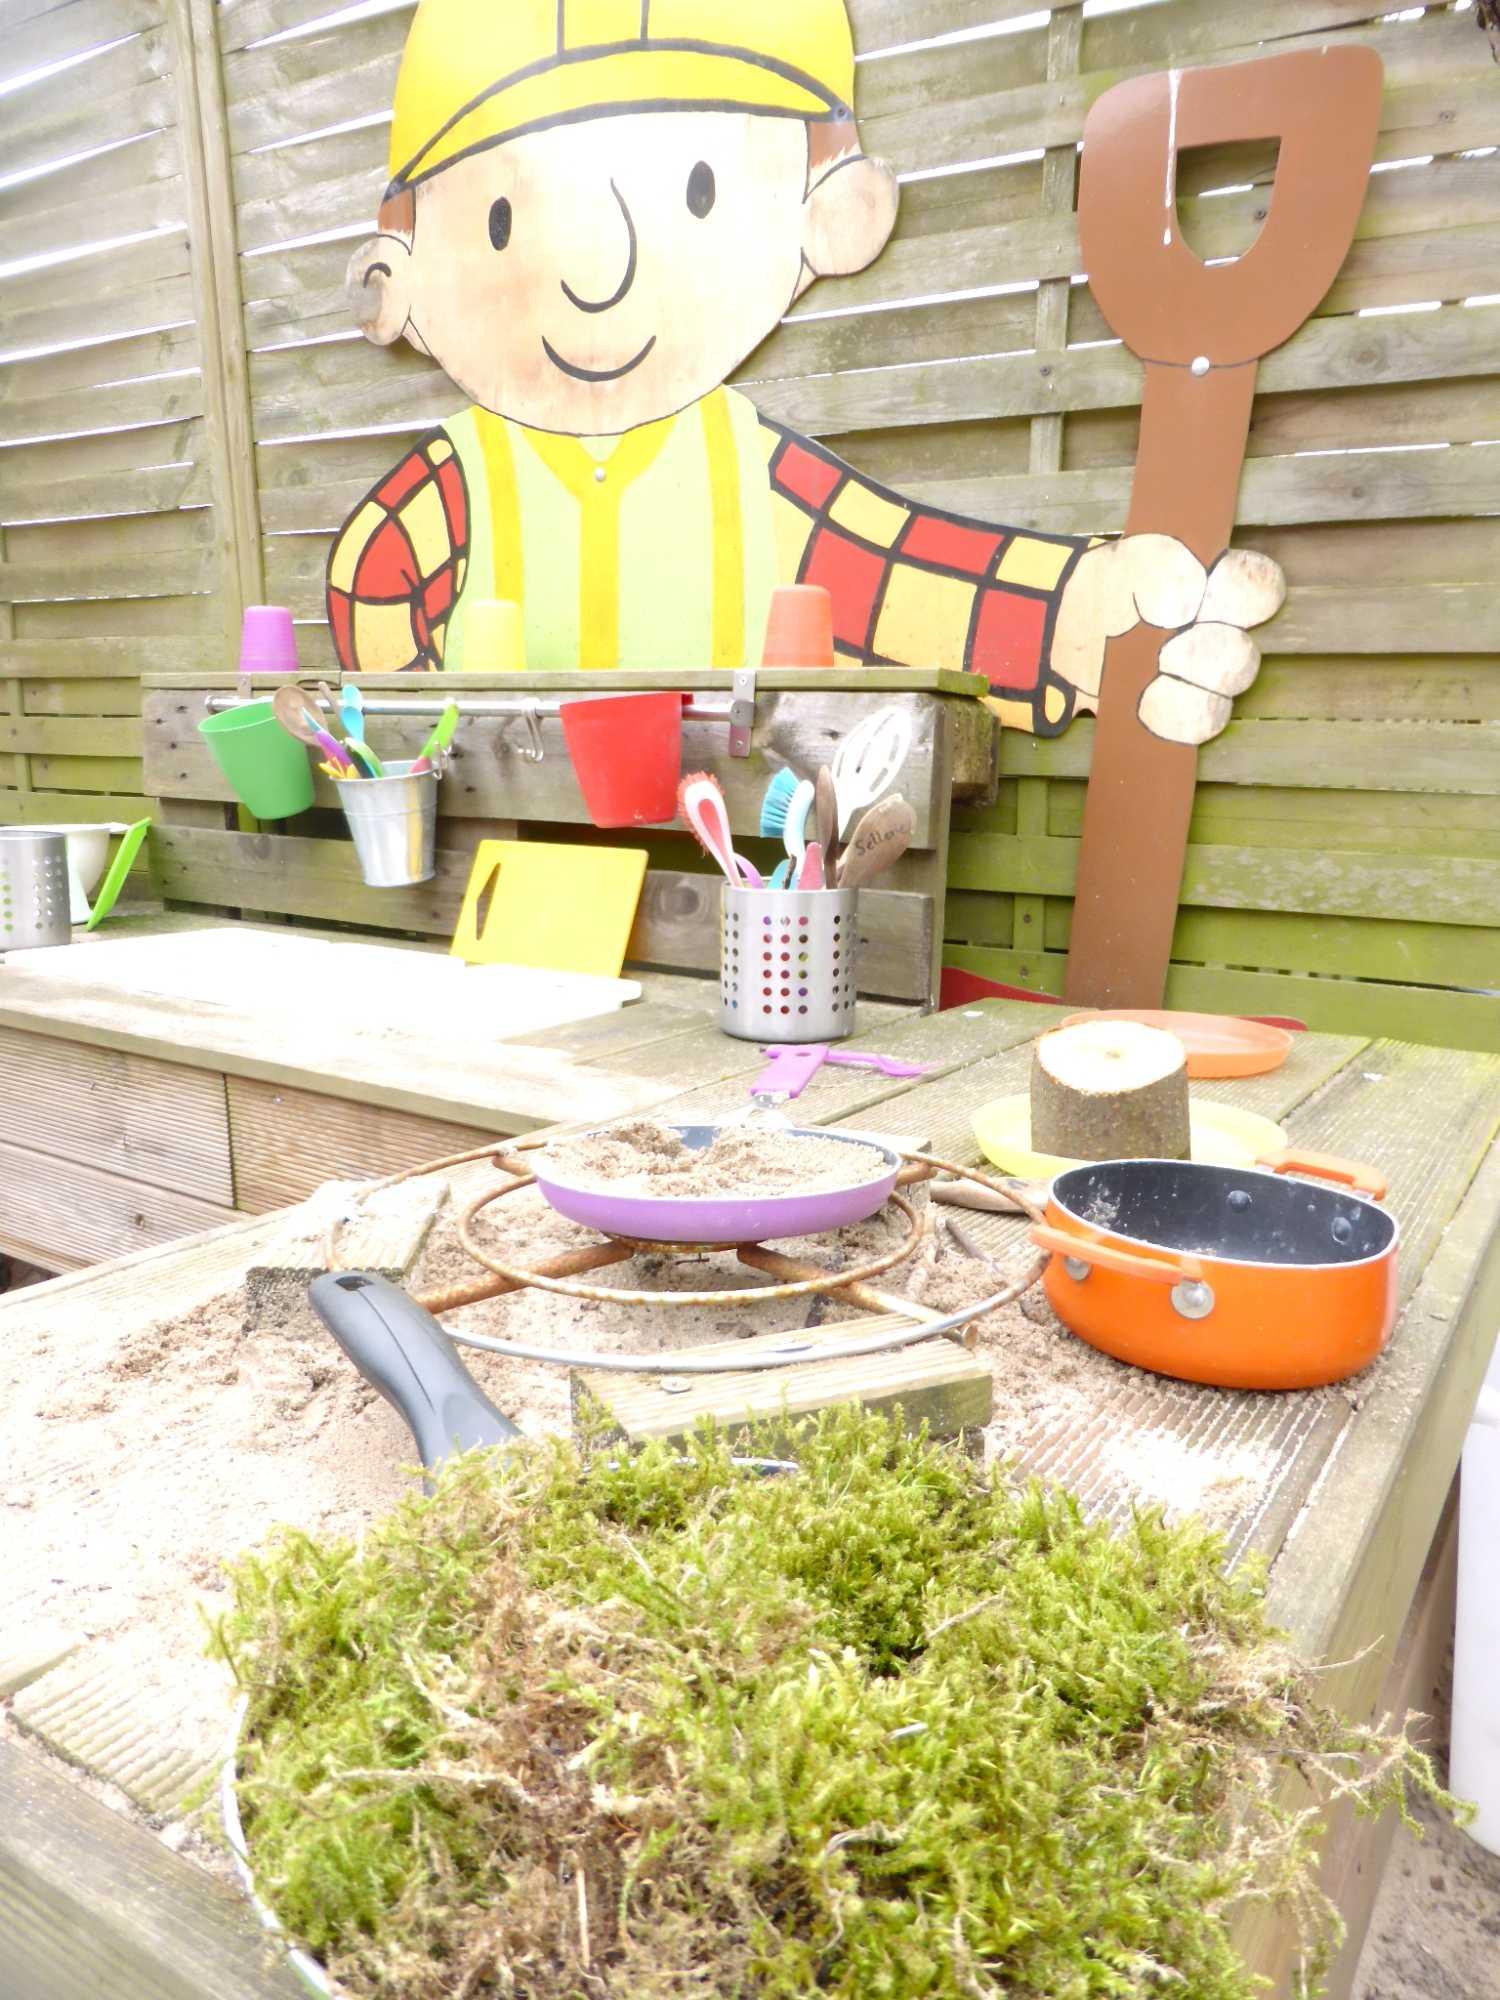 Kita Kid Zone Kinderbetreuung Matschküche 2 - Outdoor-Kinderküche